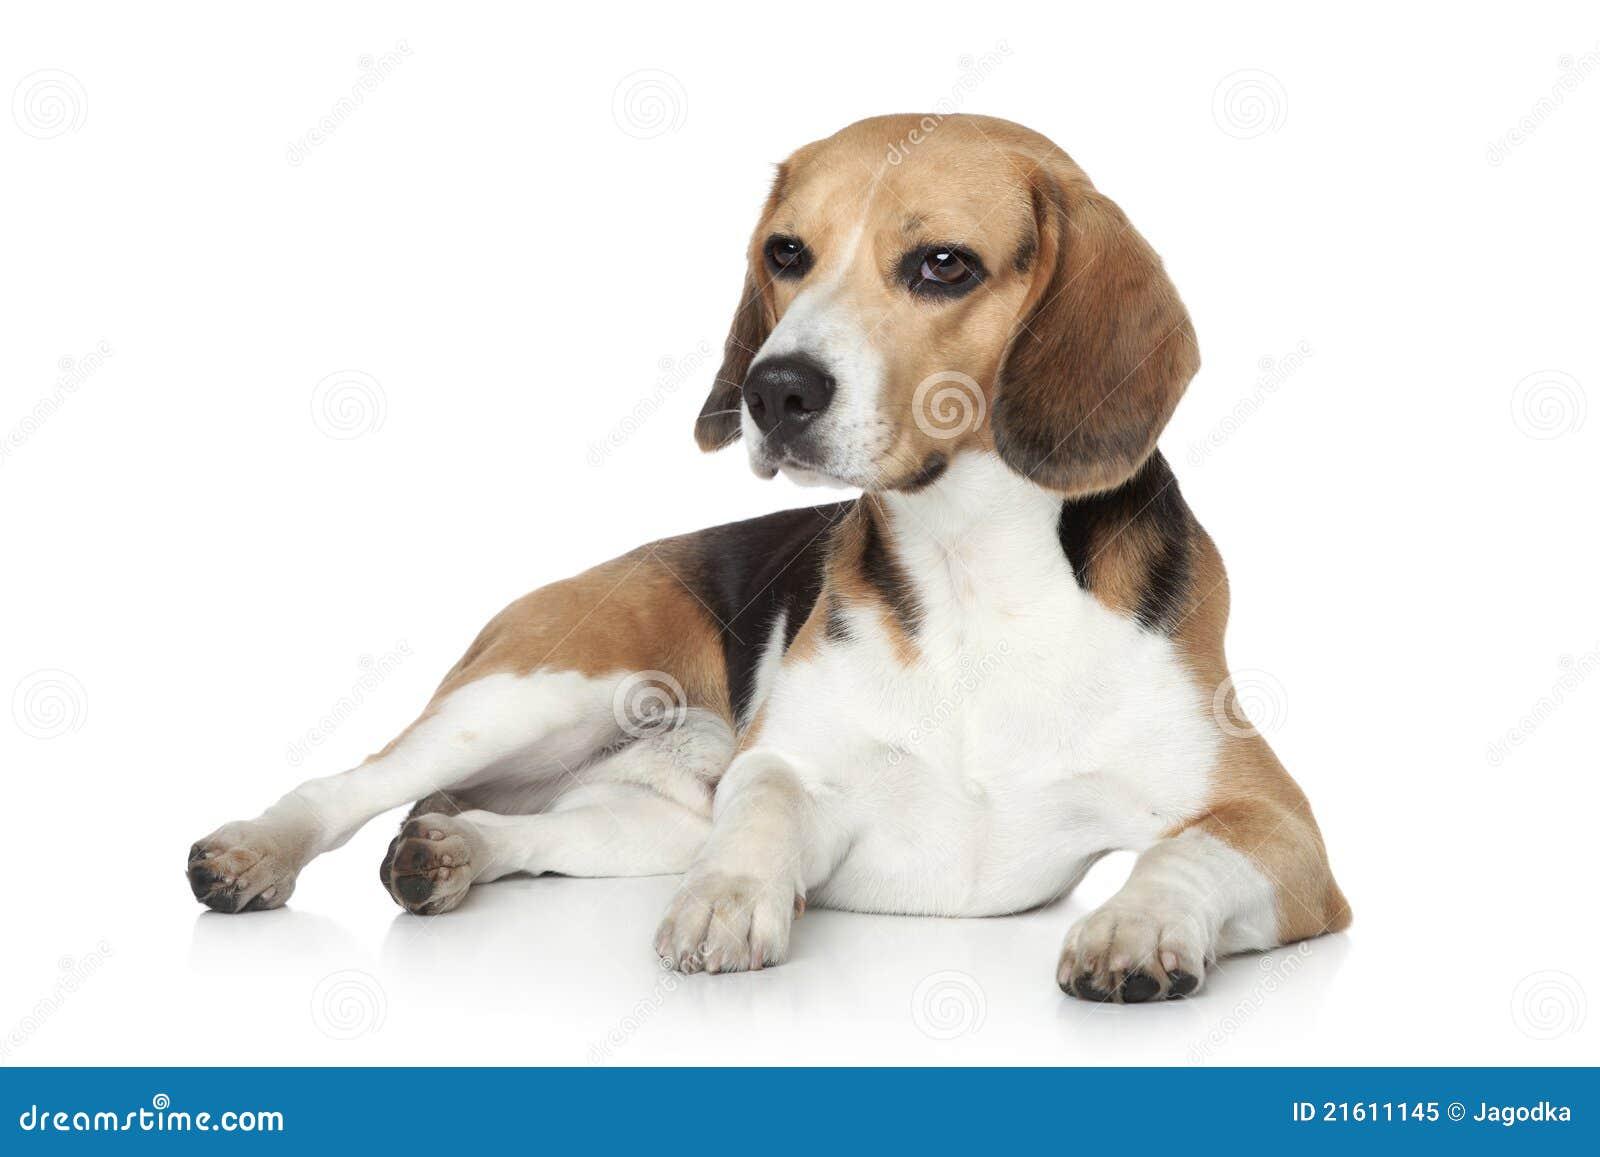 beagle_image